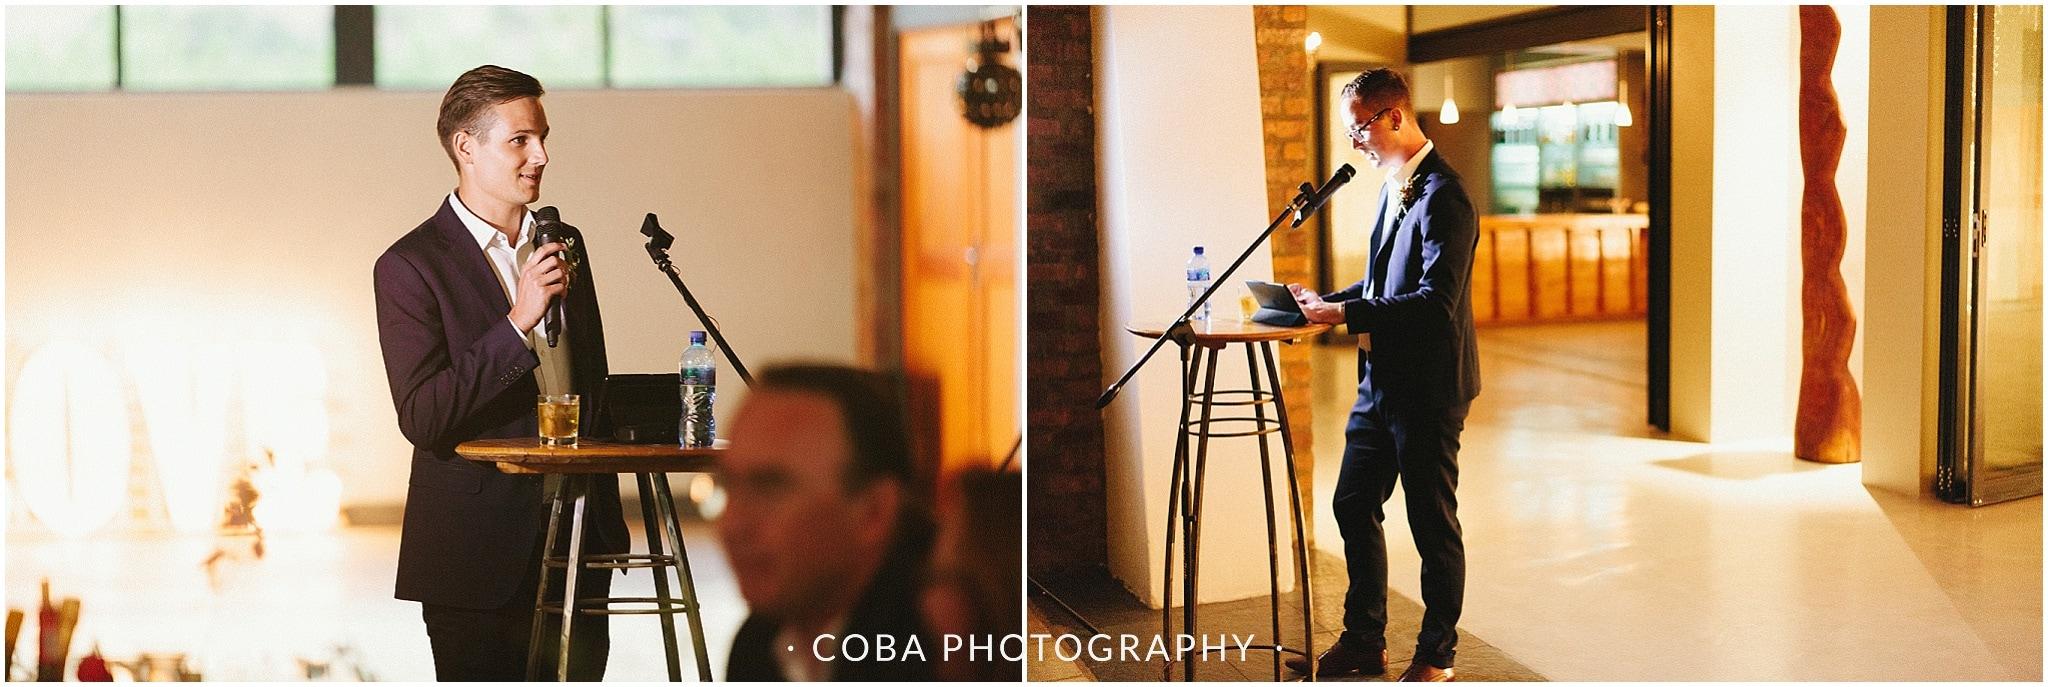 John&Pad - Olive Rock - Coba Photography (160)